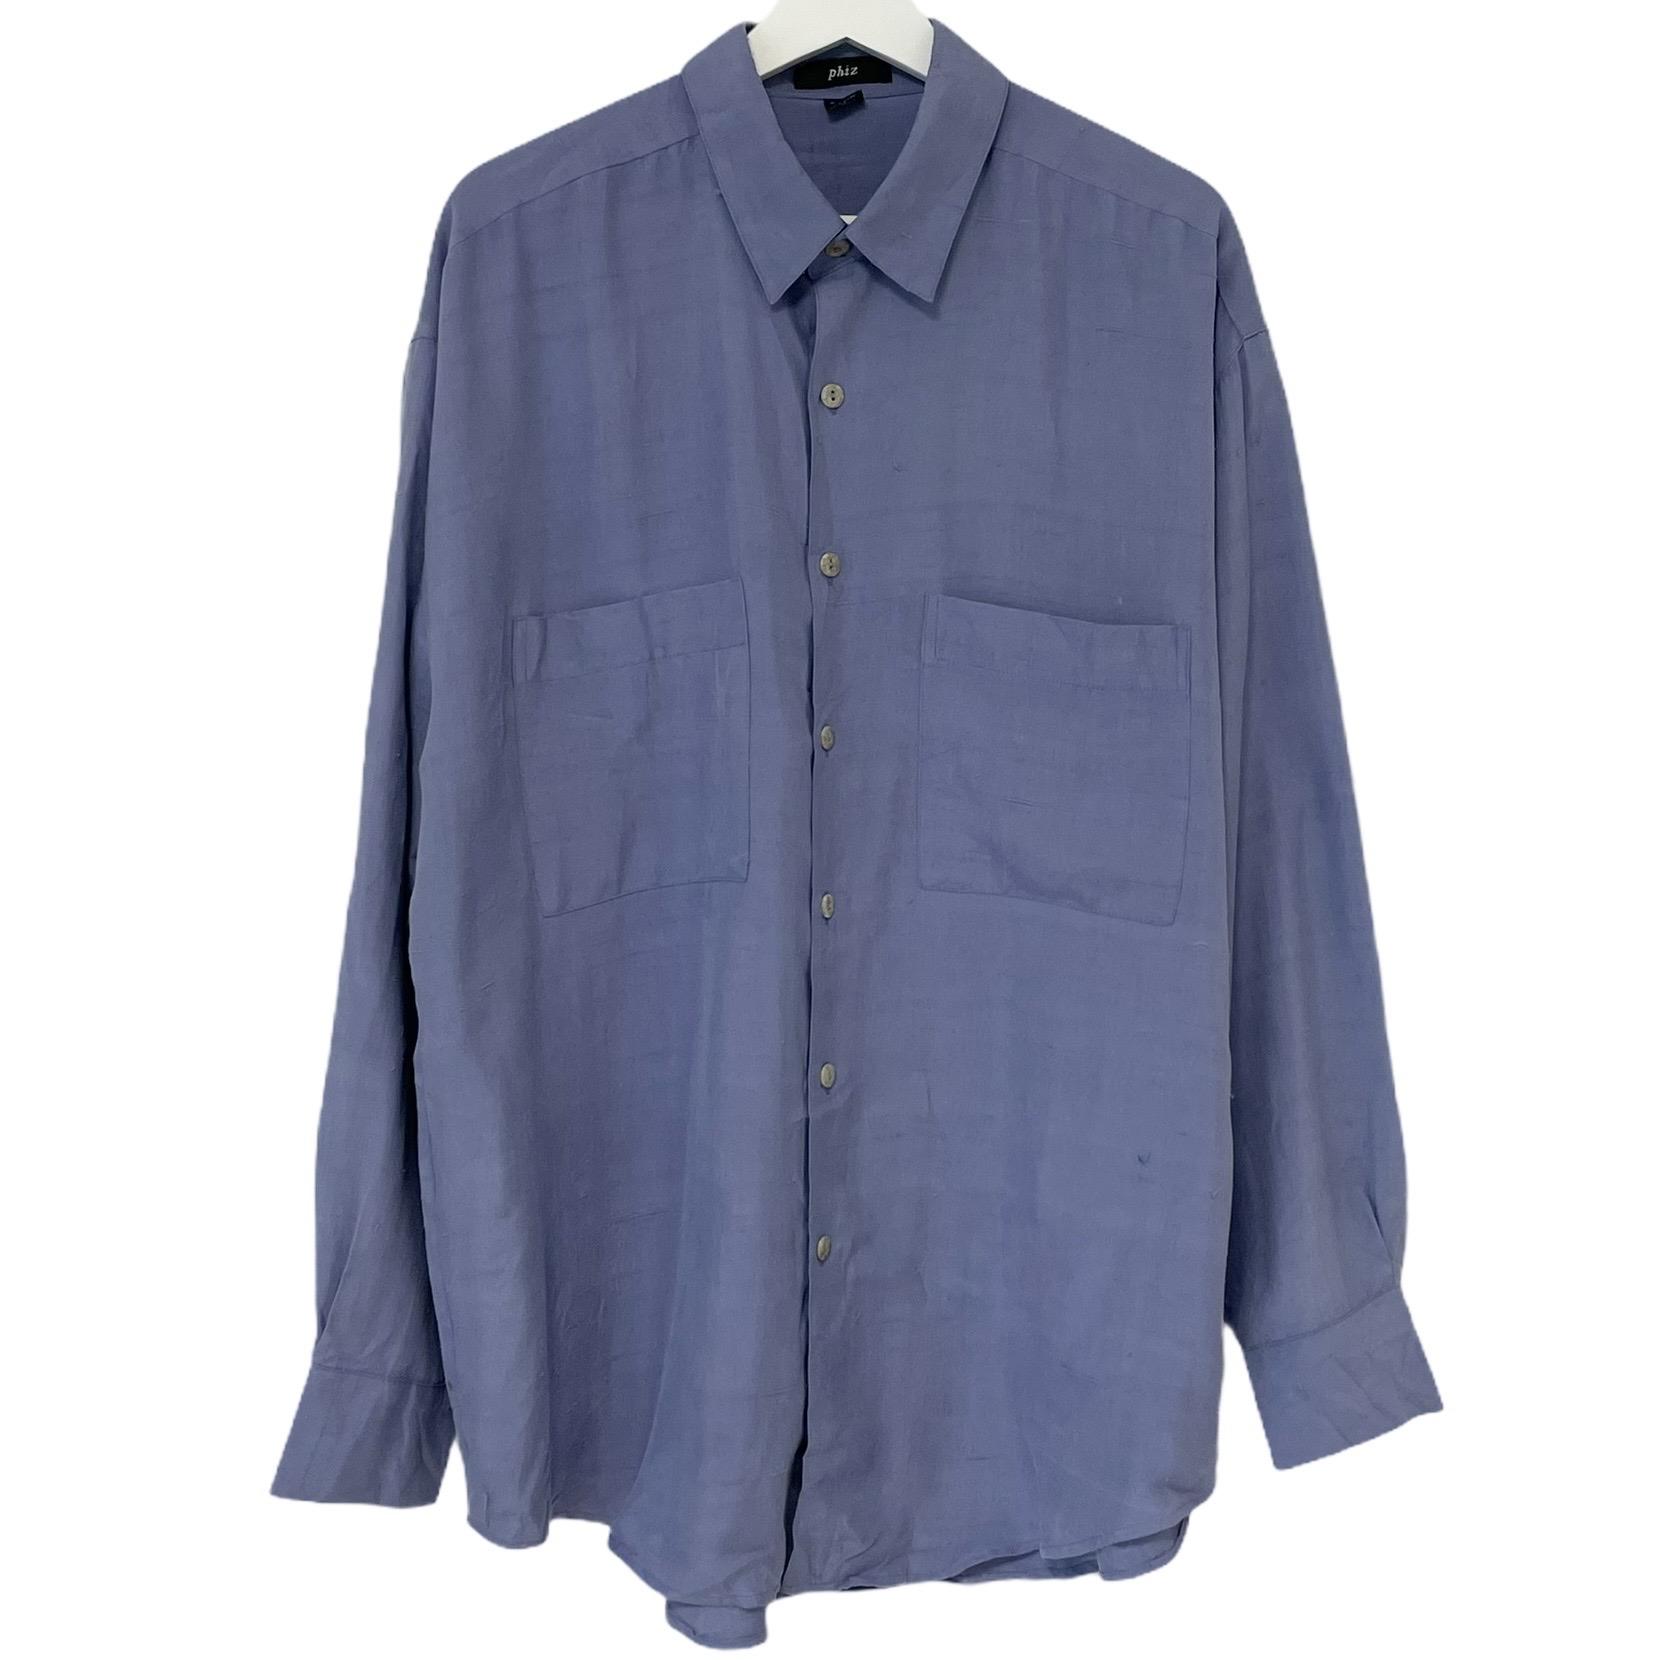 Dead Stock 90's phiz Silk Shirt フィズ GRAPE プレゼント ライトブルー 格安 デッドストック シルク シャツ